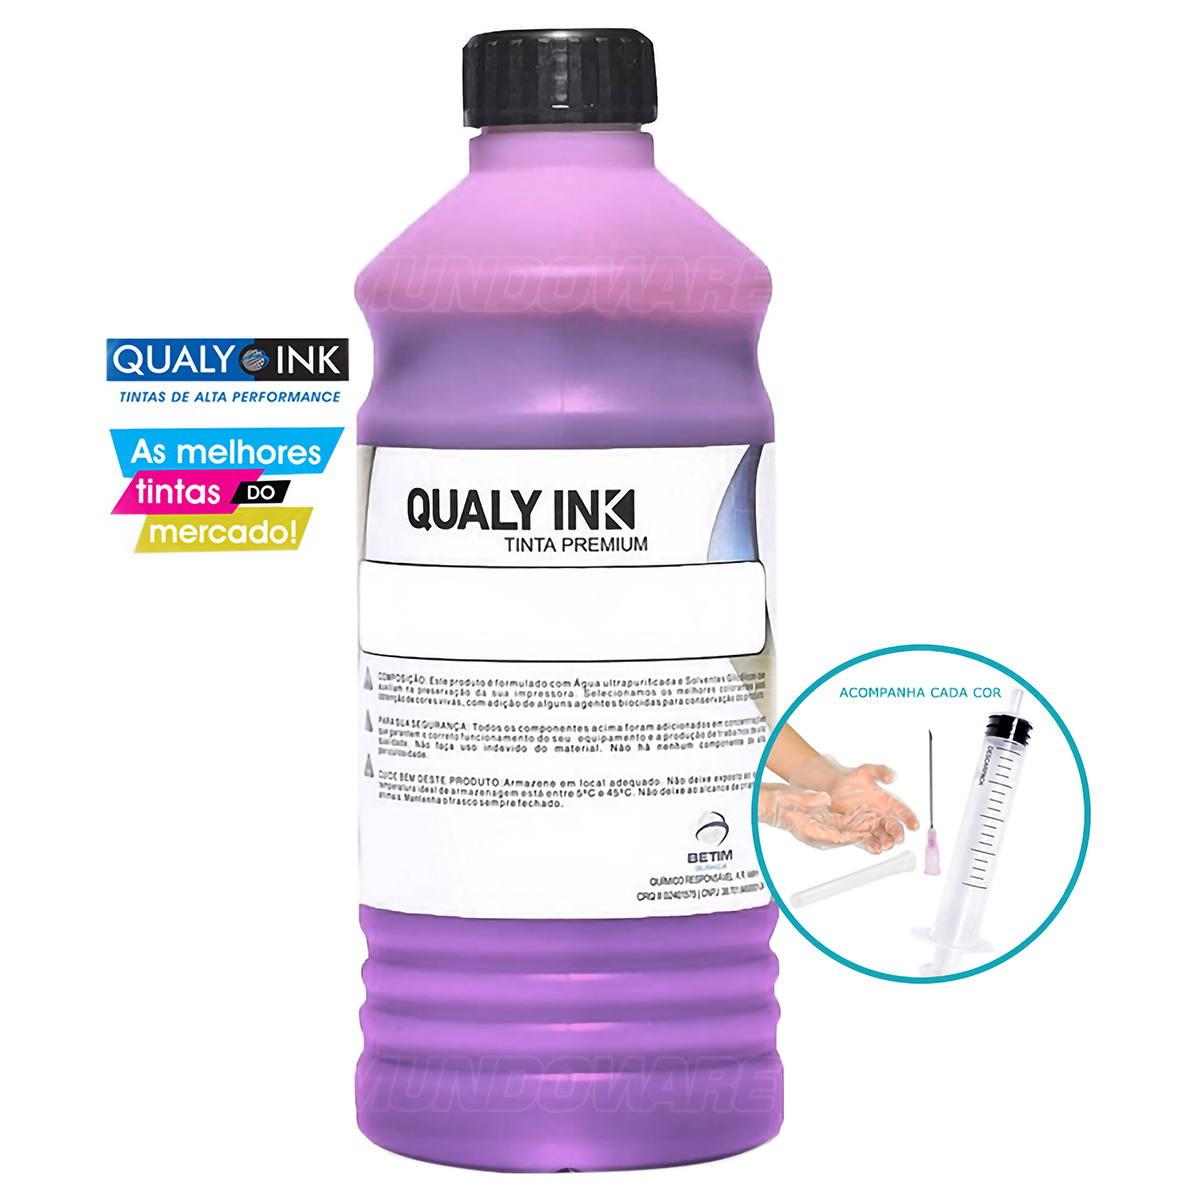 Compatível: Tinta Corante Qualy-Ink MC1H-697 para Recarga de Cartuchos HP série 3000 Magenta 1L